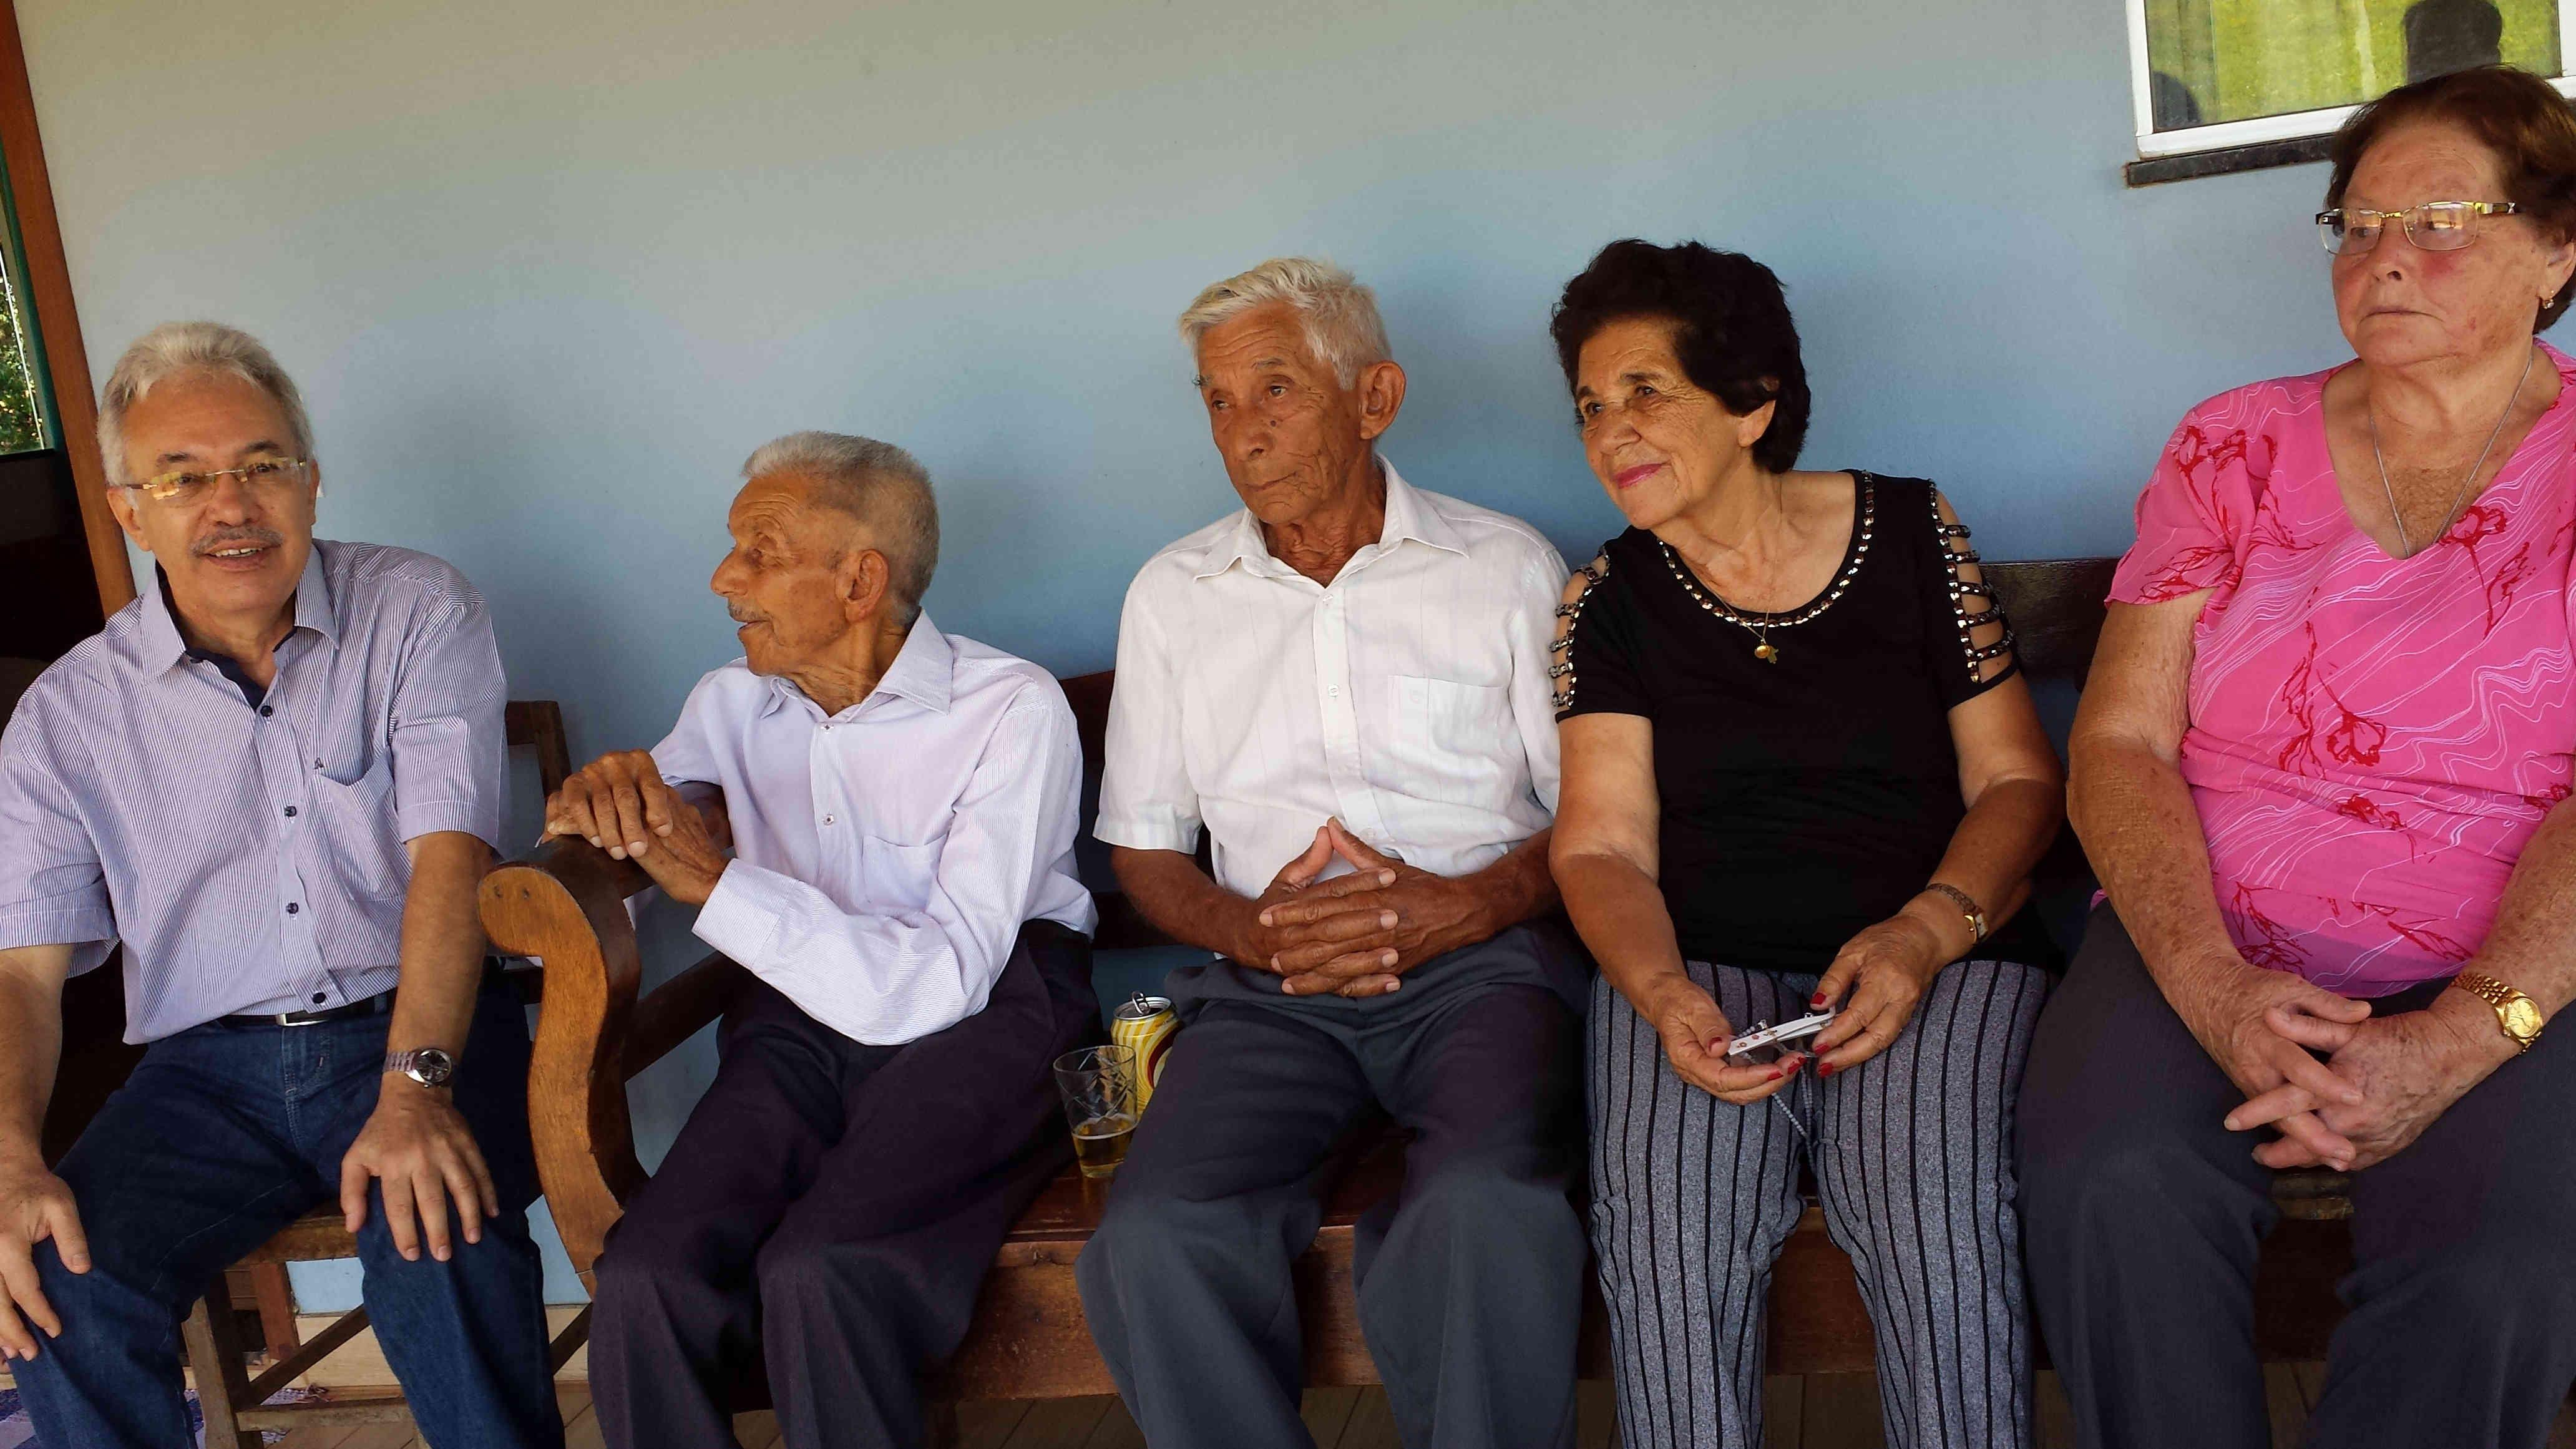 Airton, José Nicolau, tio Tonico, tia Fia, tia Aurora